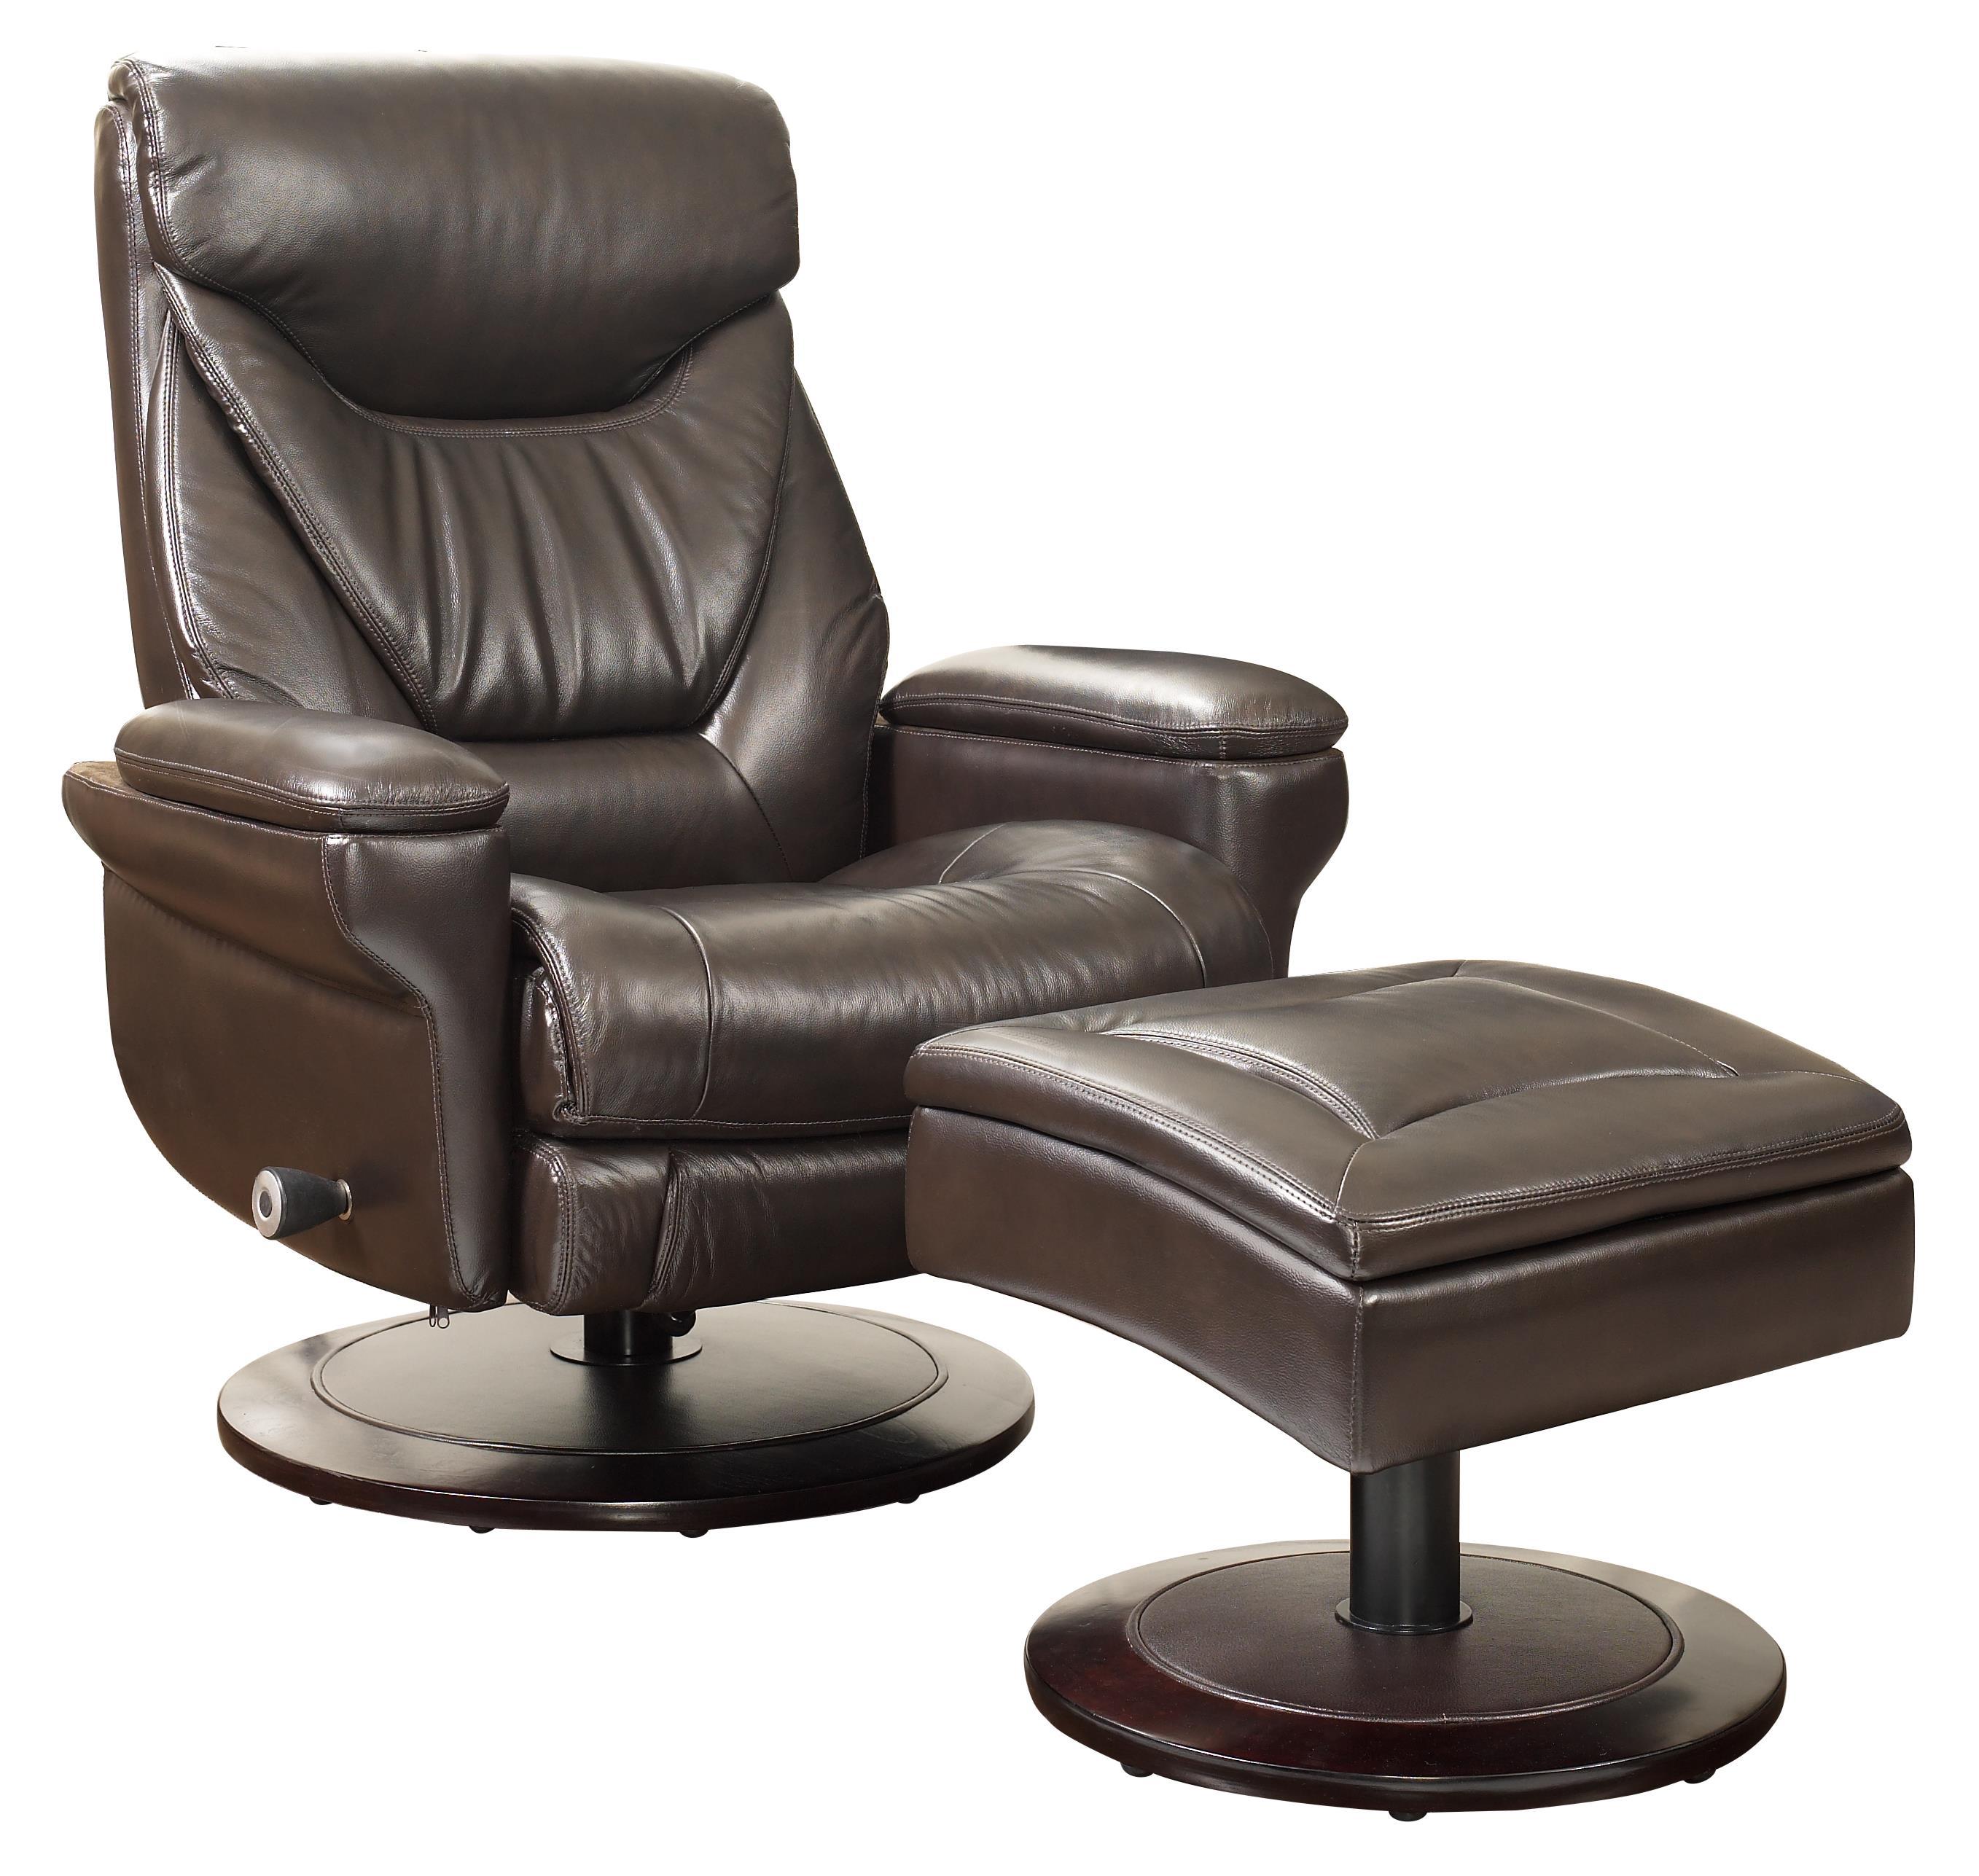 Cinna Pedestal Chair and Ottoman by Barcalounger at Sprintz Furniture